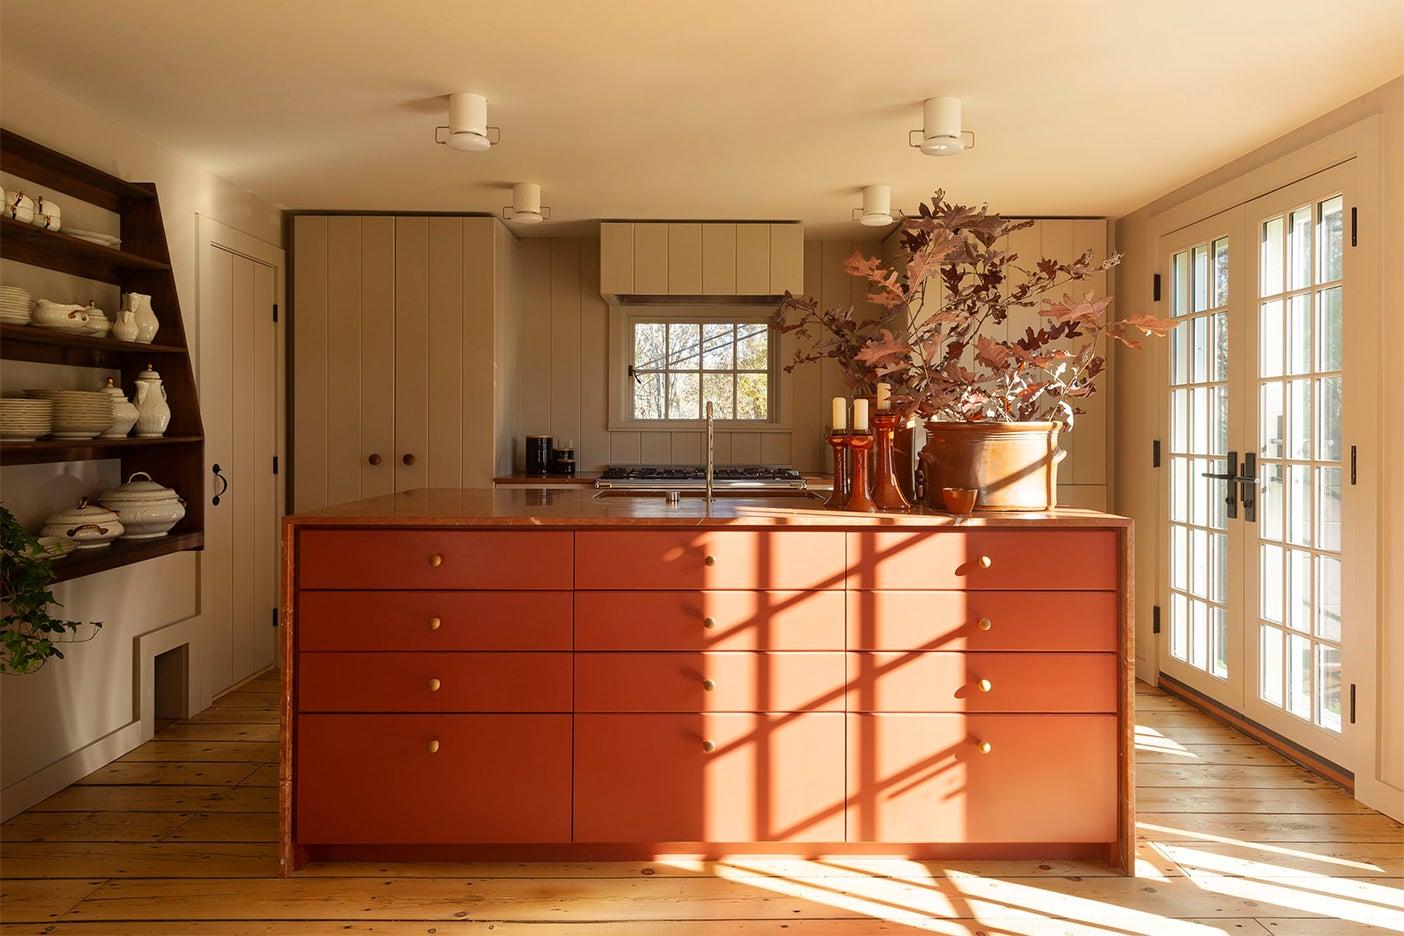 Rust orange kitchen cabinet color